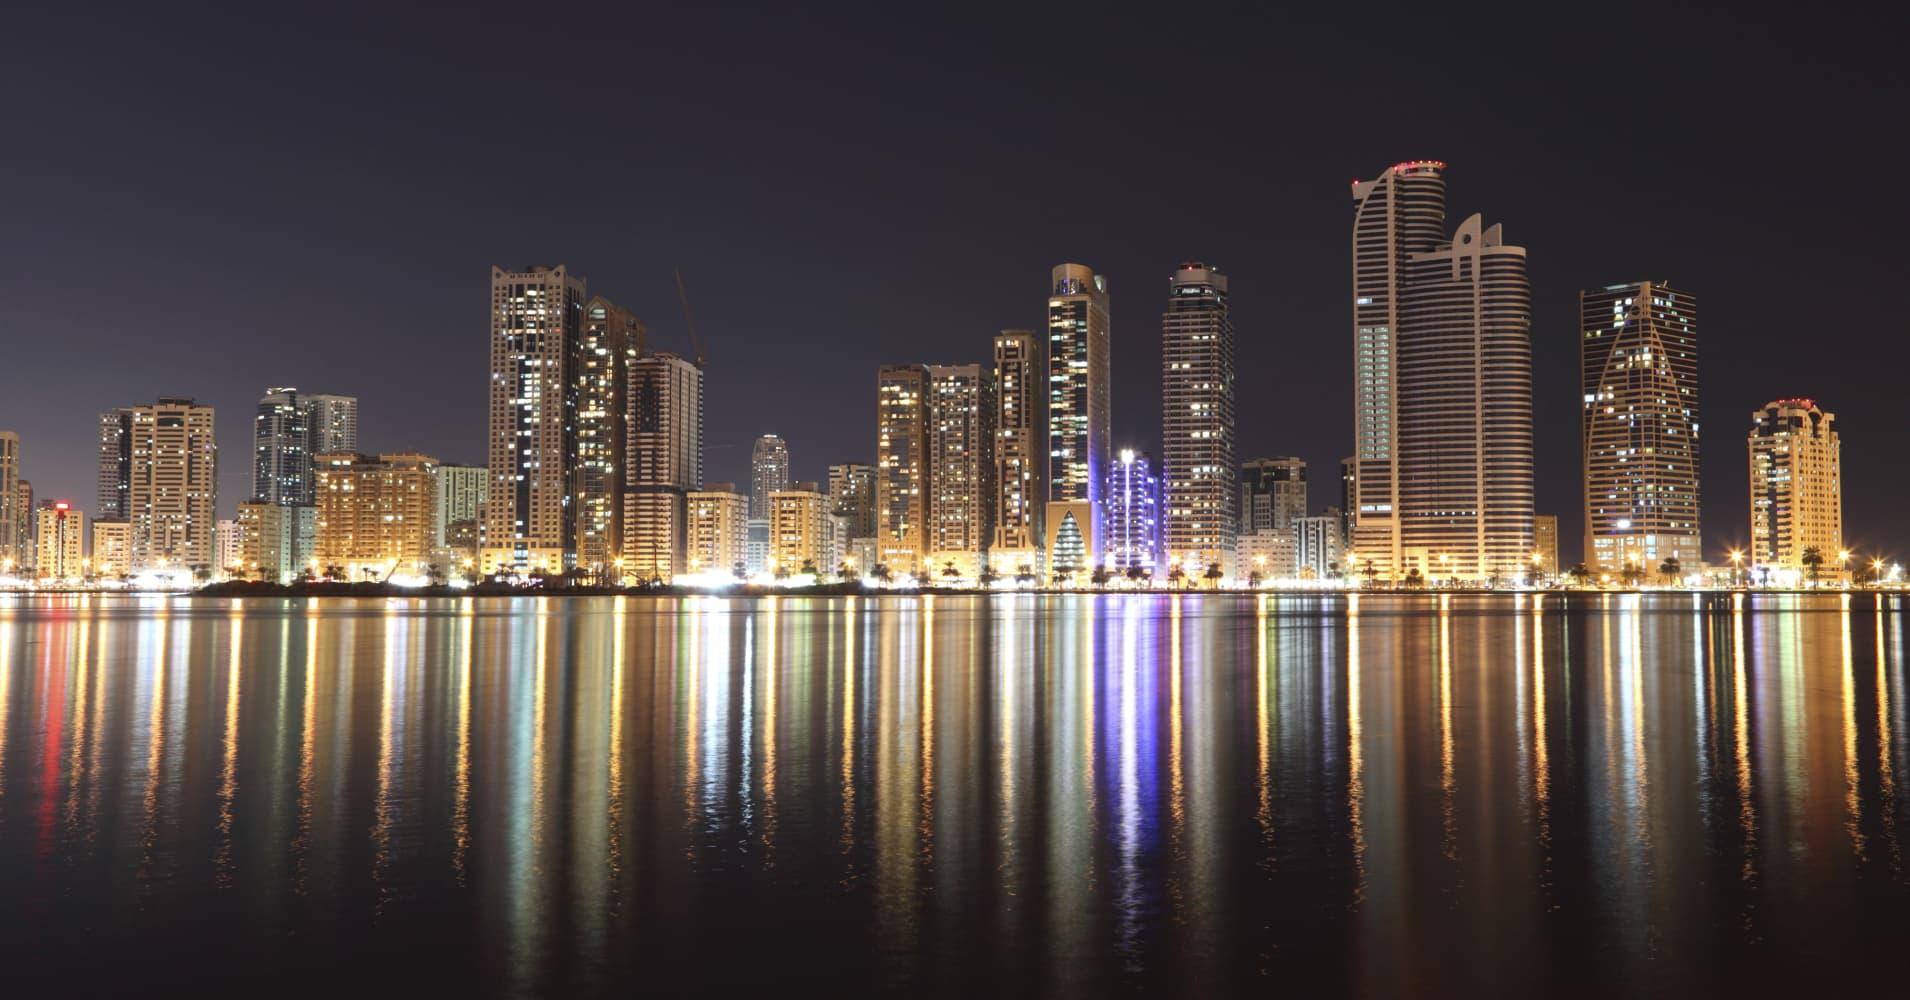 UAE's Gargash says alternative to Qatar demands is 'not escalation but parting ways'